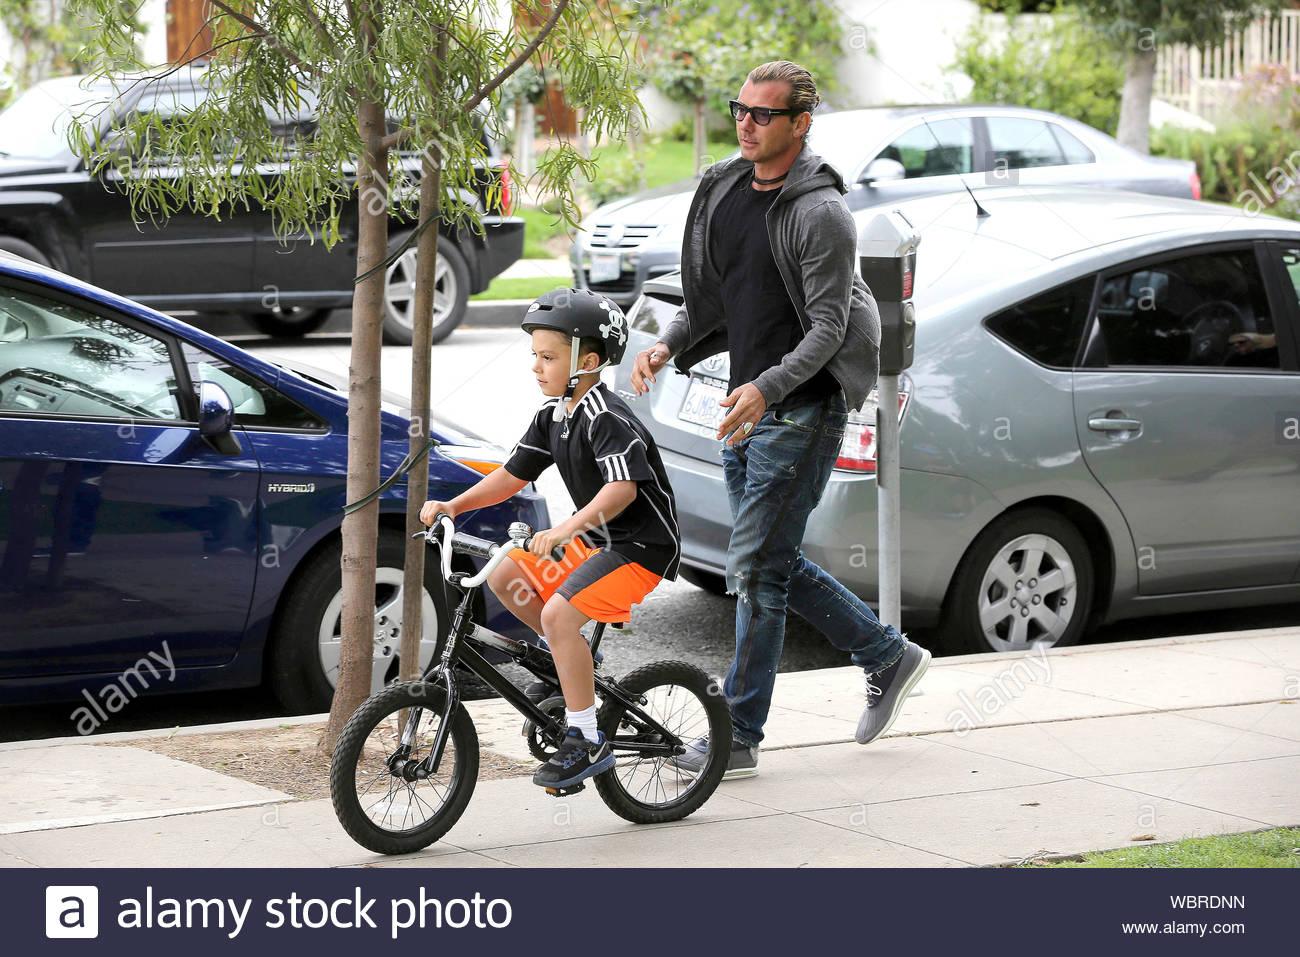 Mann strumpfhose fahrrad